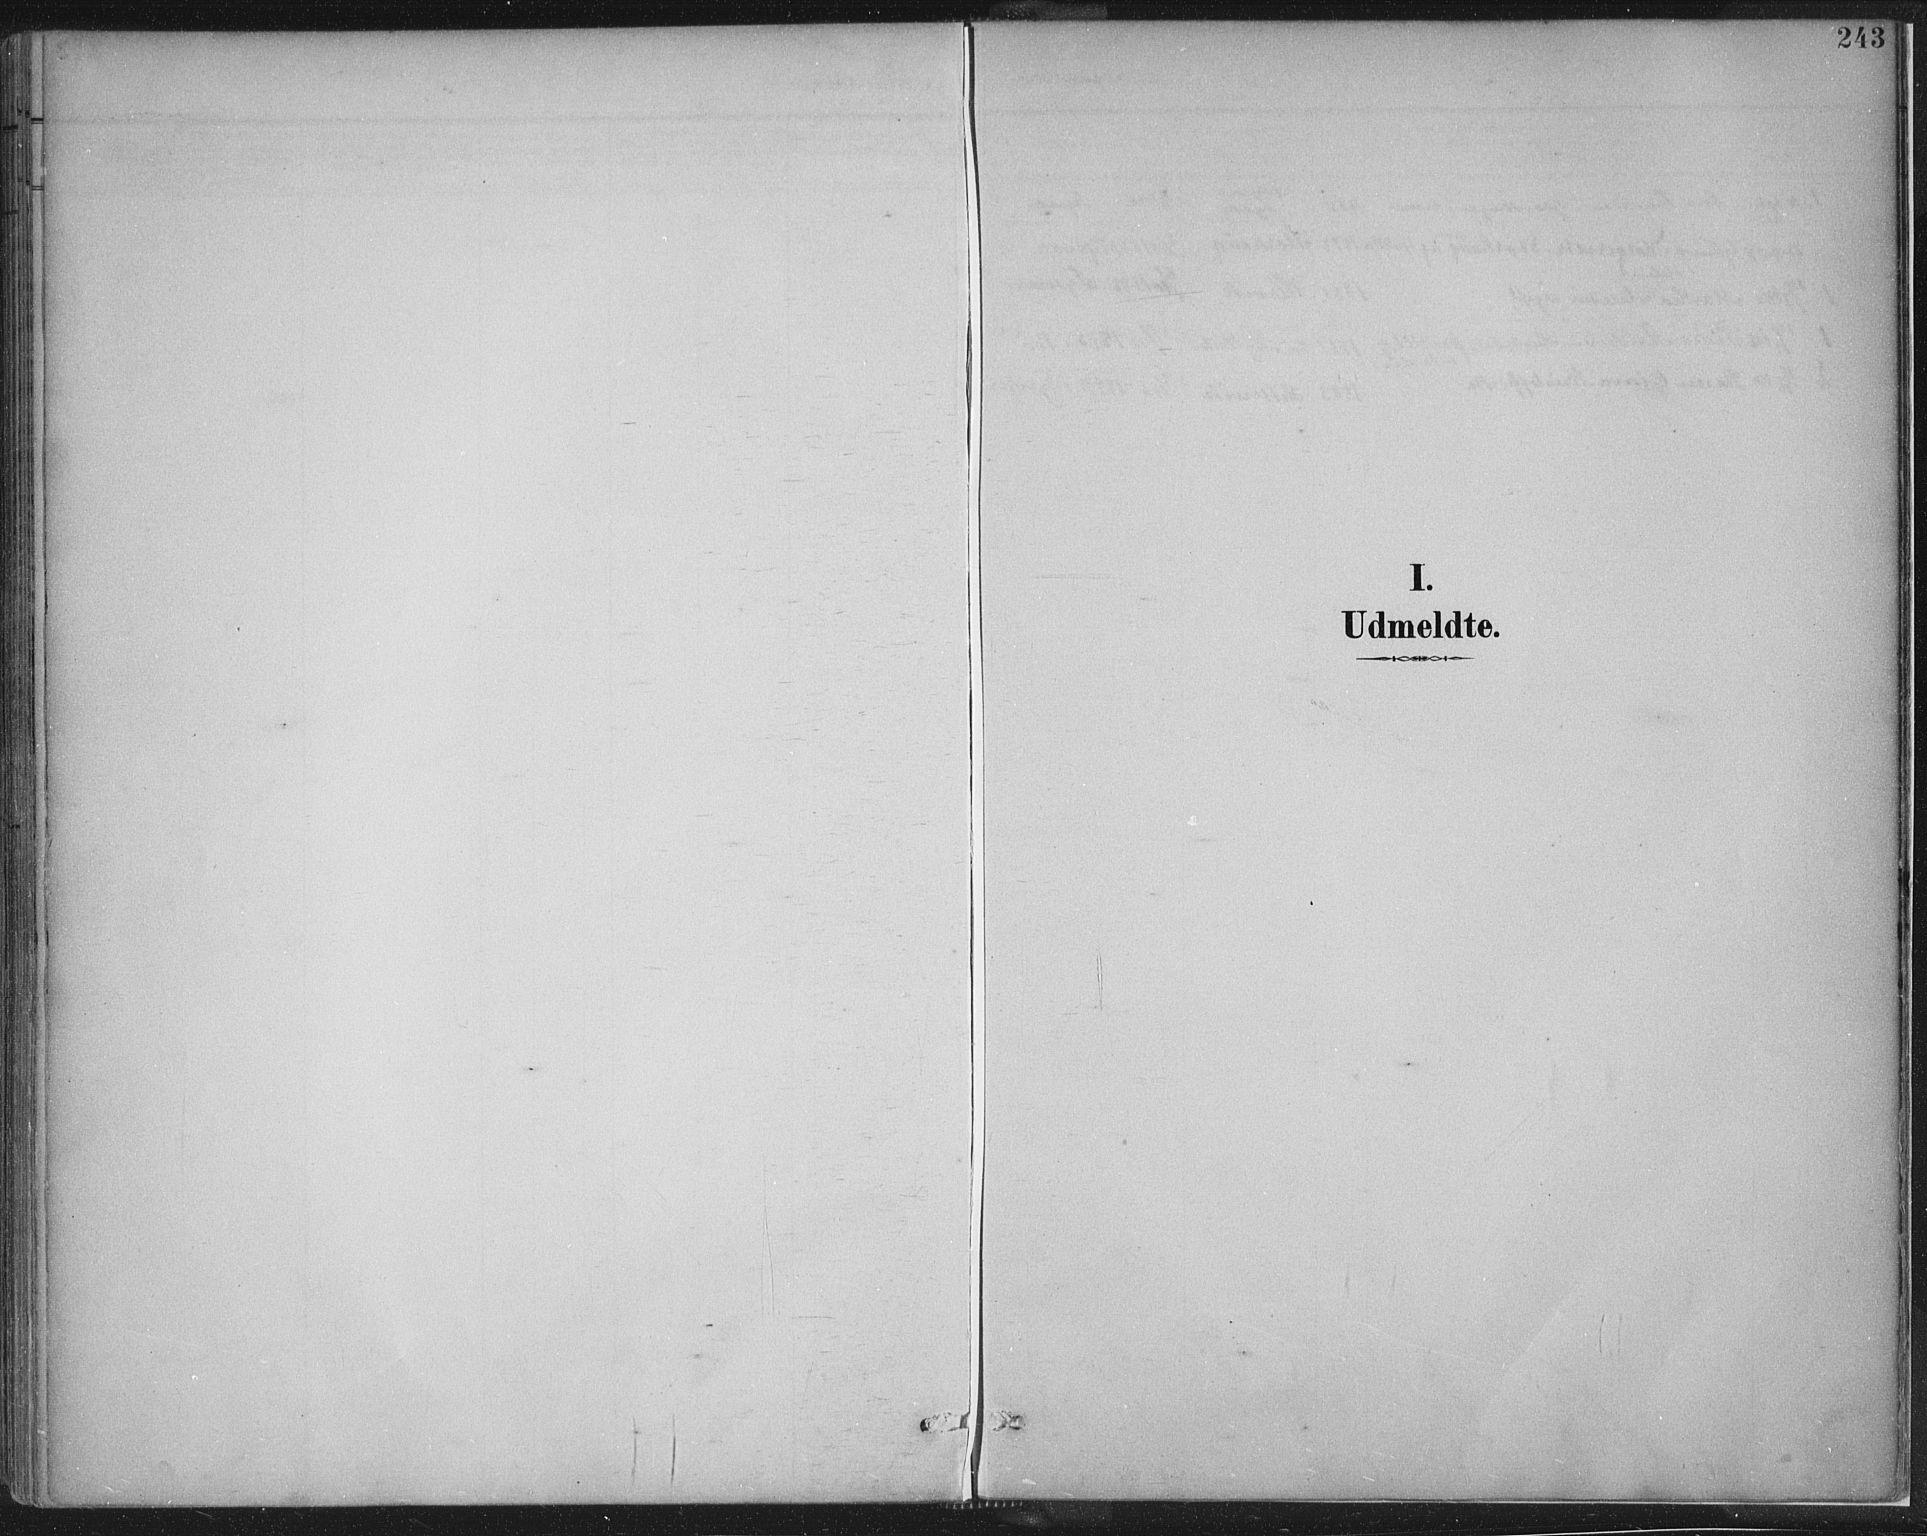 SAST, Tysvær sokneprestkontor, H/Ha/Haa/L0008: Ministerialbok nr. A 8, 1897-1918, s. 243